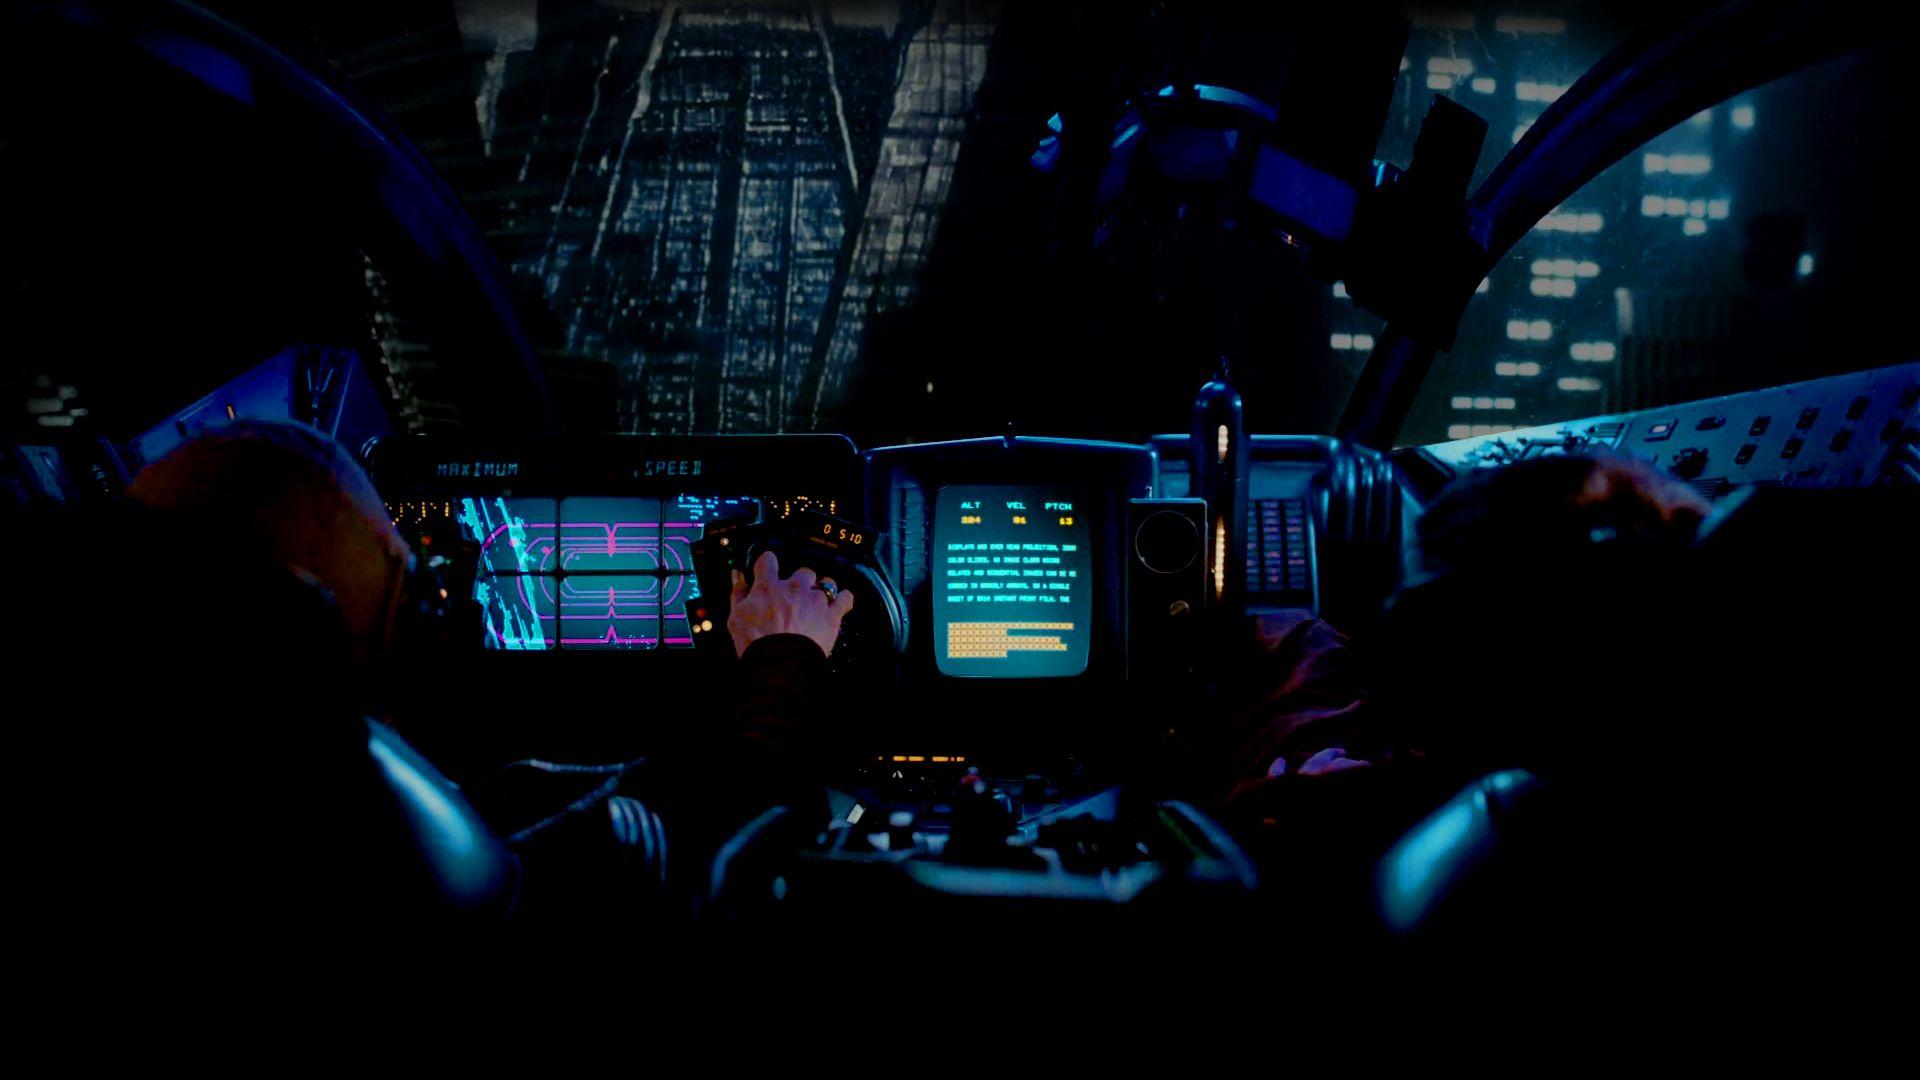 Man Standing On Open Field Digital Wallpaper Blade Runner 2049 Dual Monitors Dual Display Blade Runner Movies 5k Blade Runner Dual Monitors Blade Runner 2049